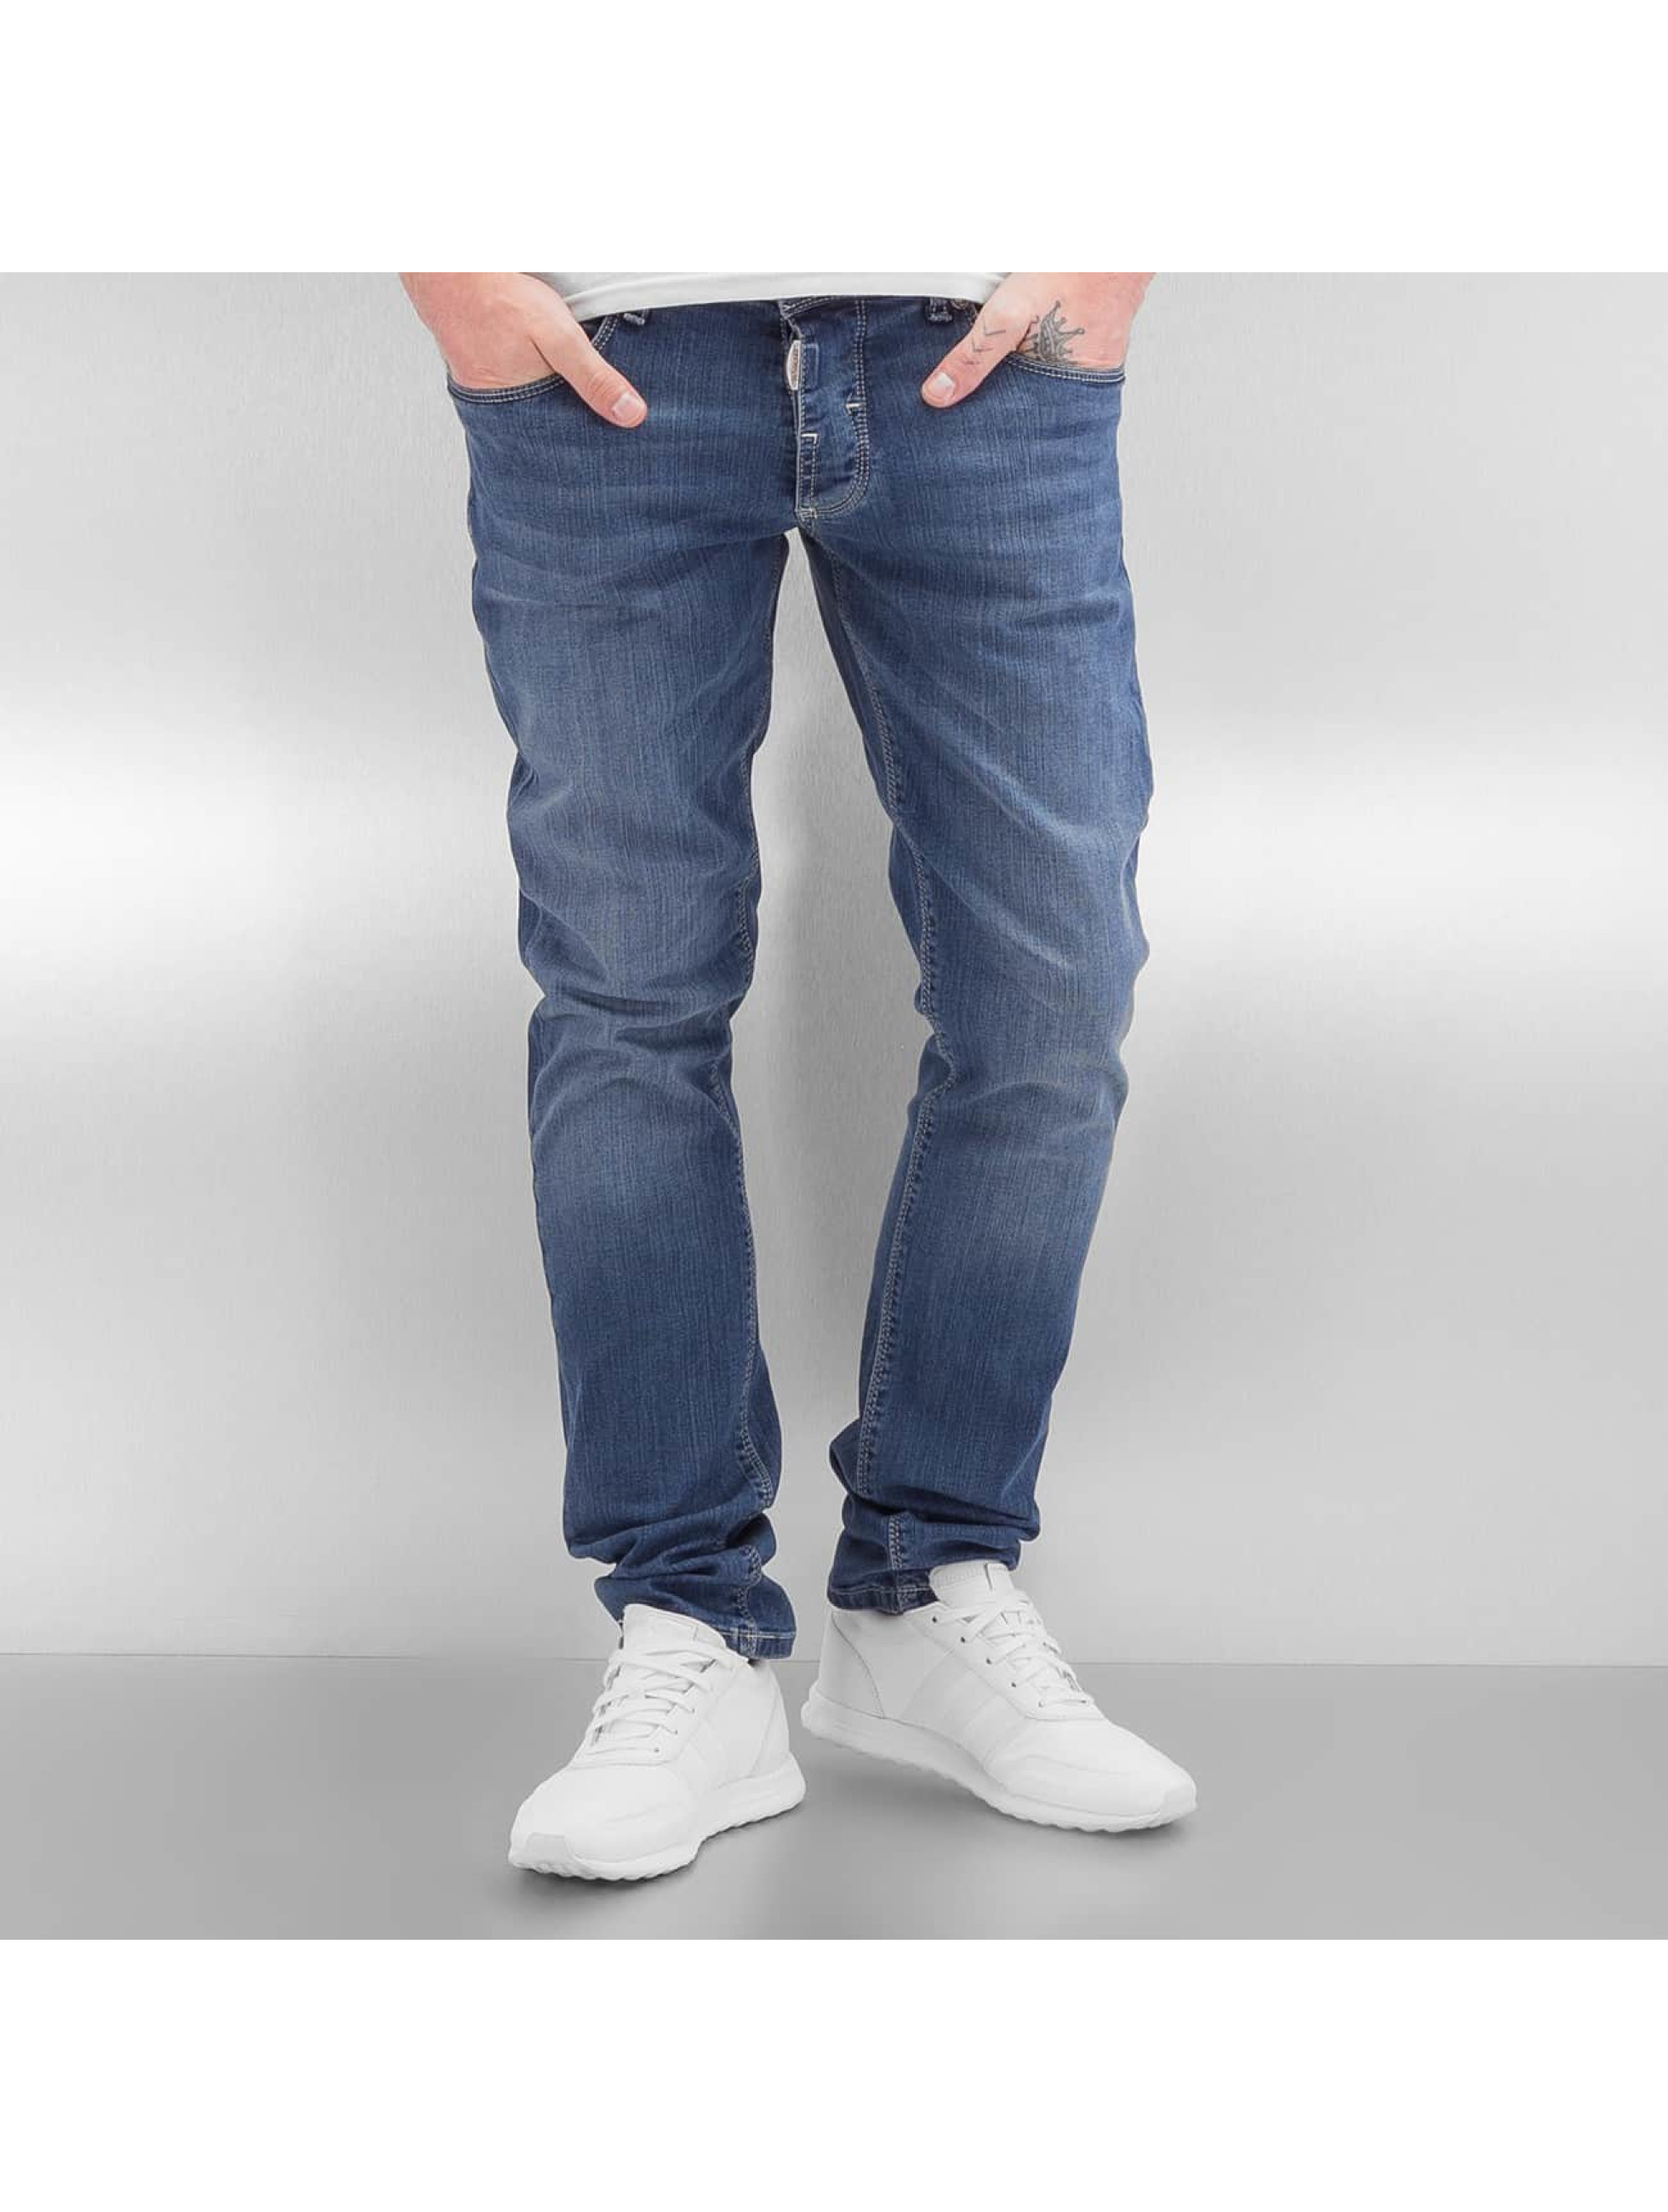 2Y Männer Slim Fit Jeans Turnhout in blau